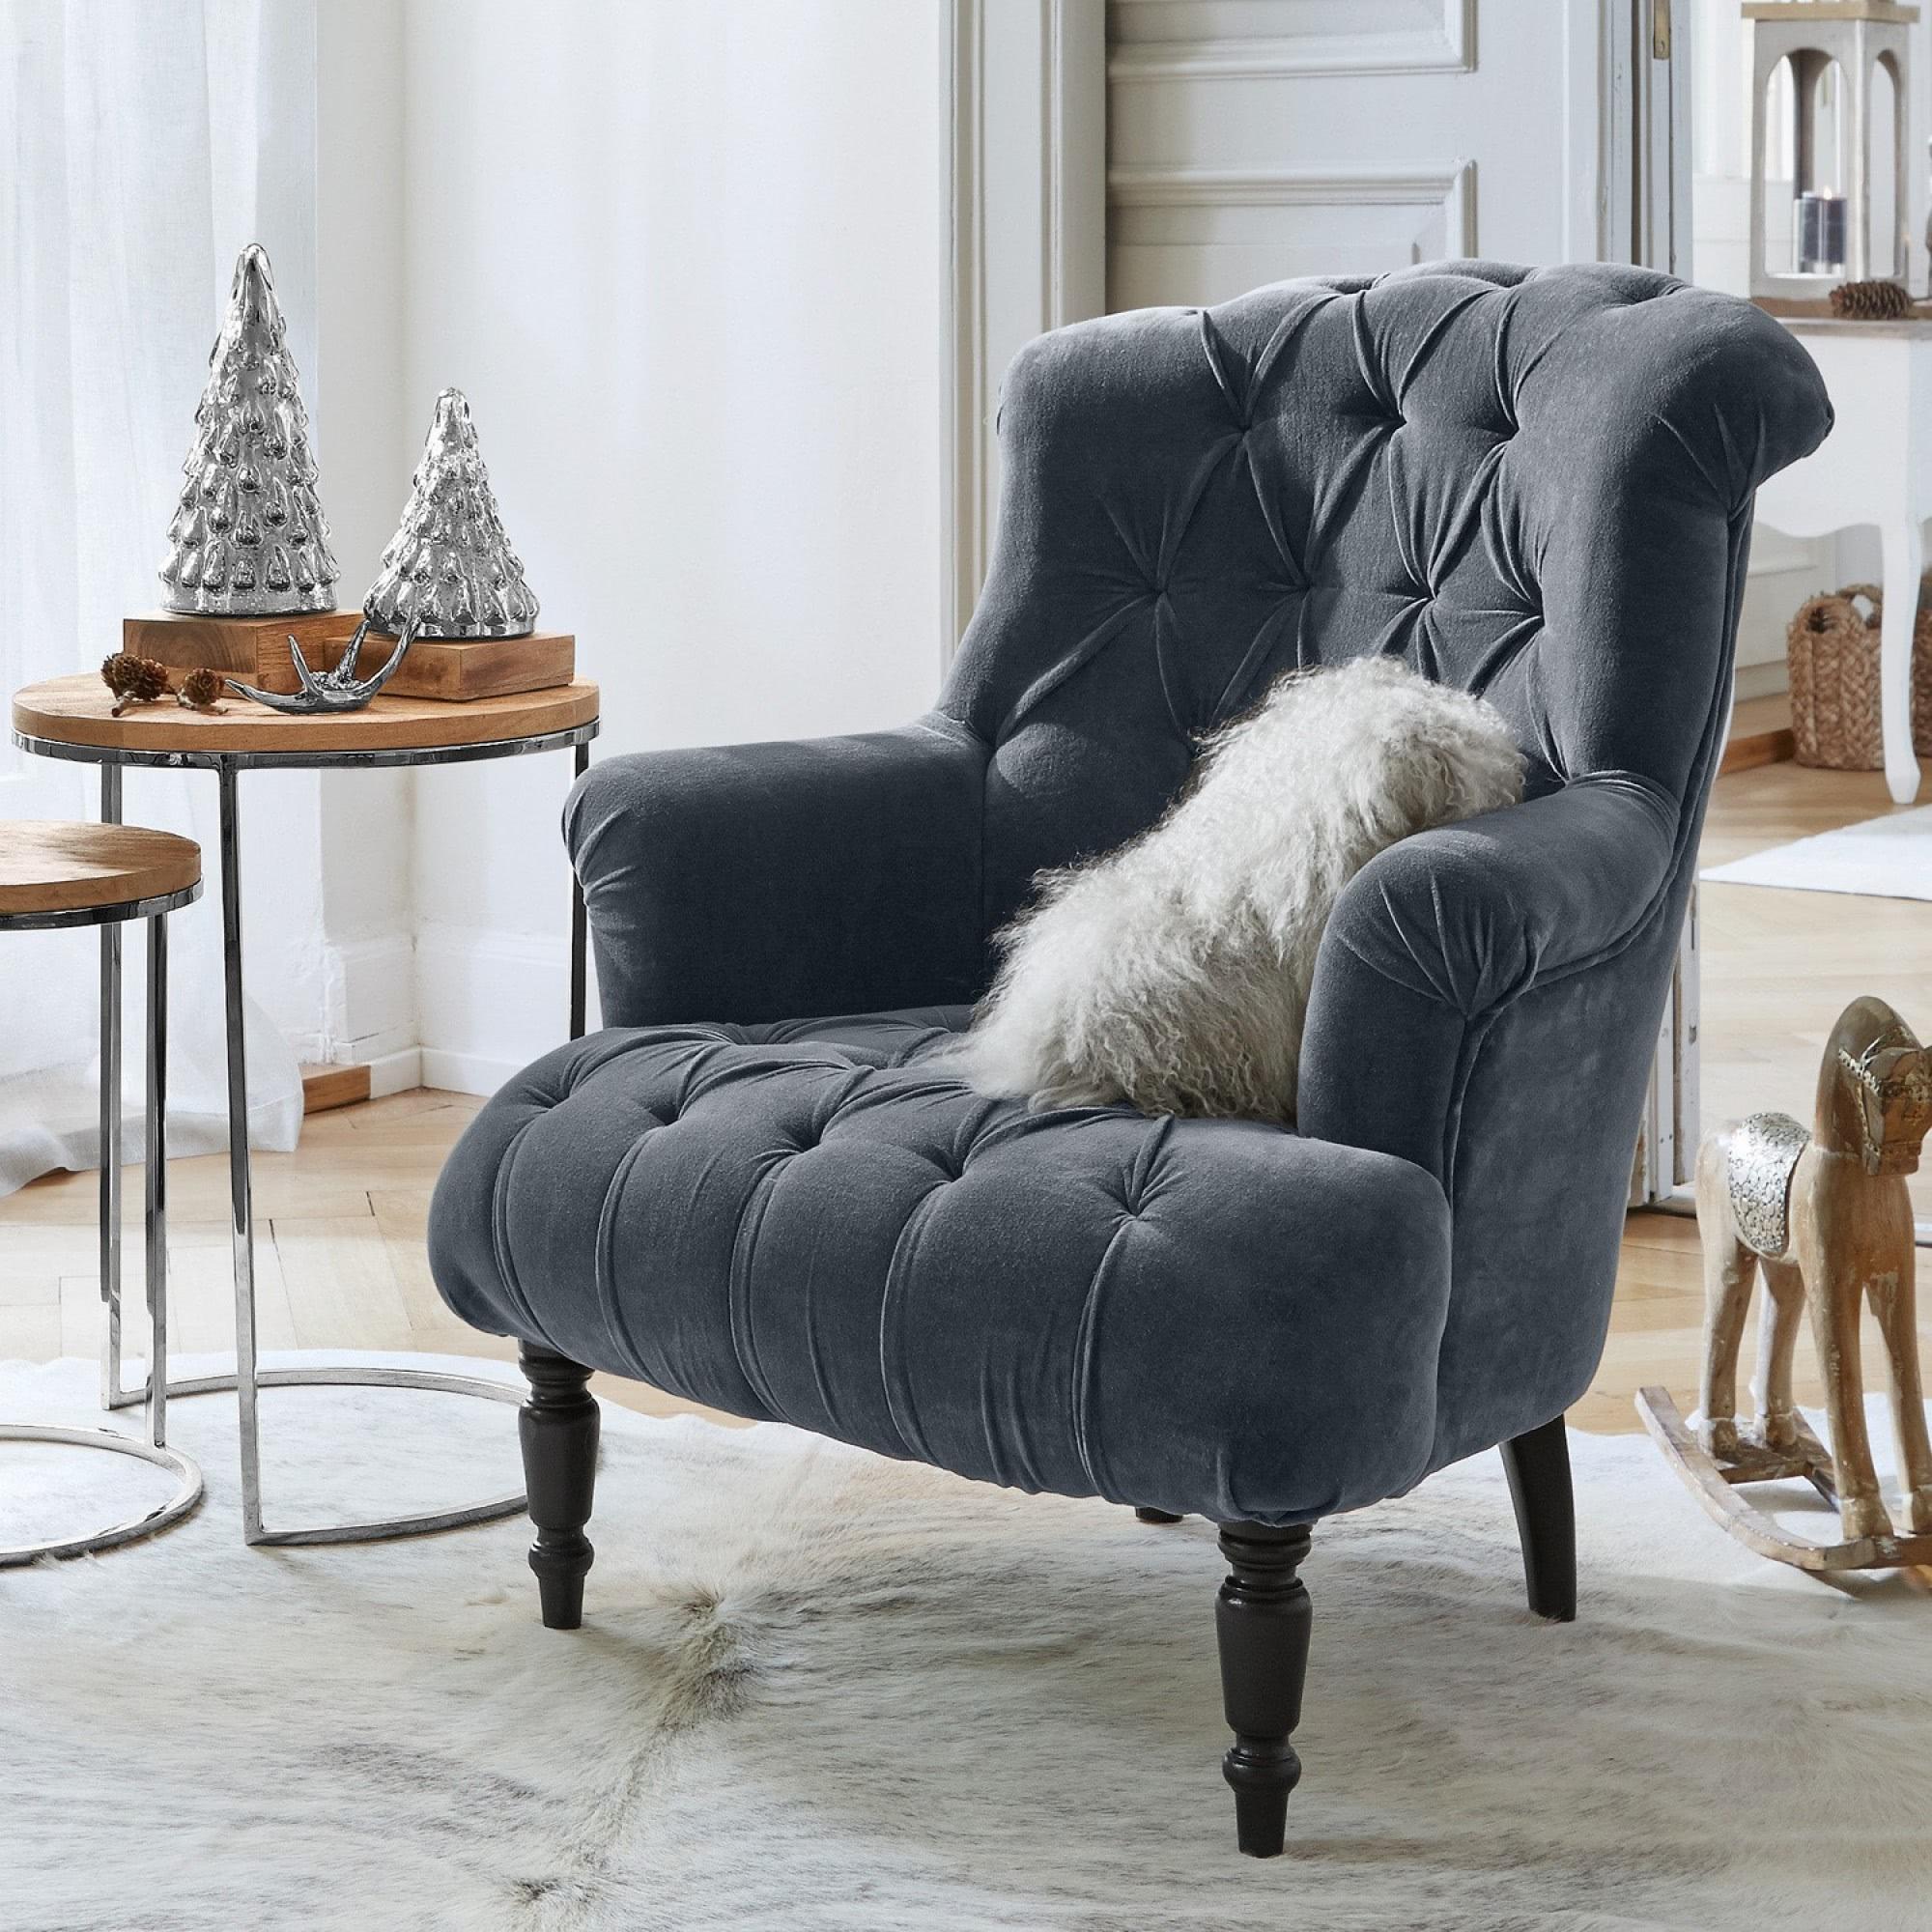 sessel parranquet loberon coming home. Black Bedroom Furniture Sets. Home Design Ideas